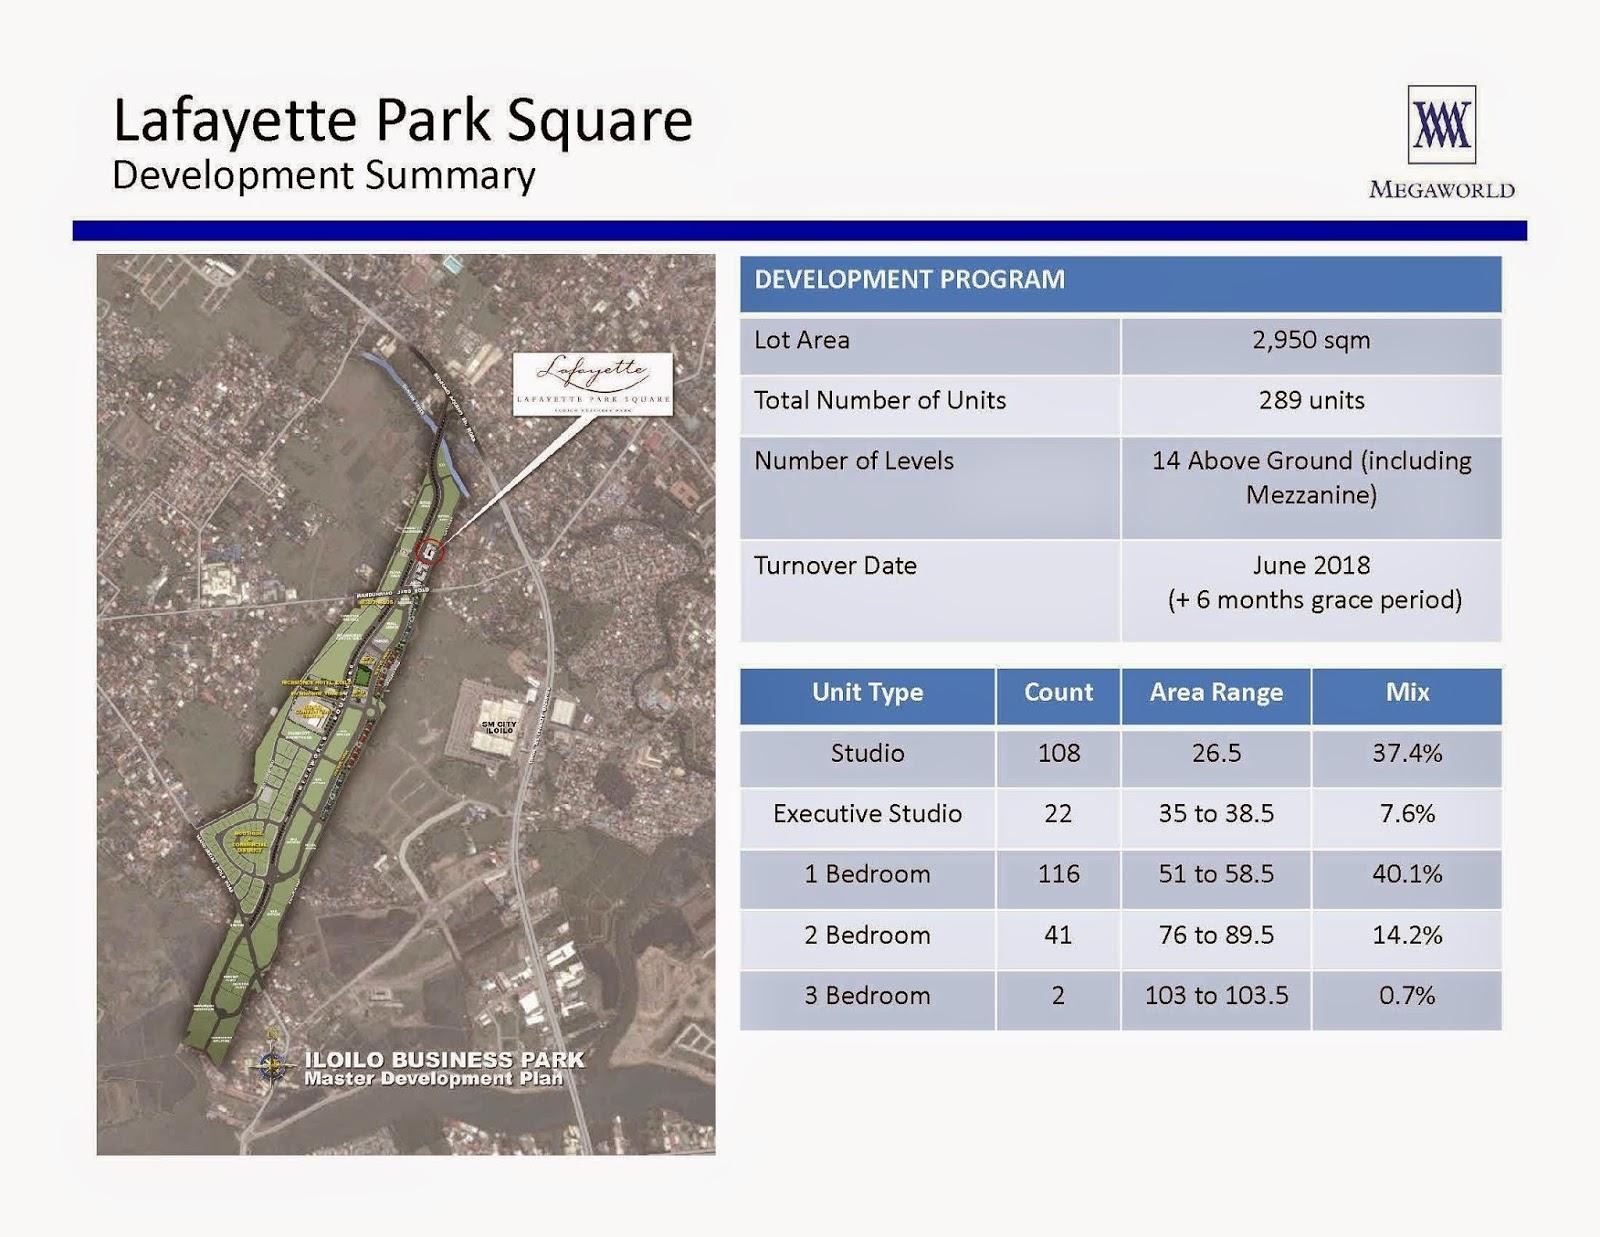 Megaworld International Lafayette Parksquare Condo At